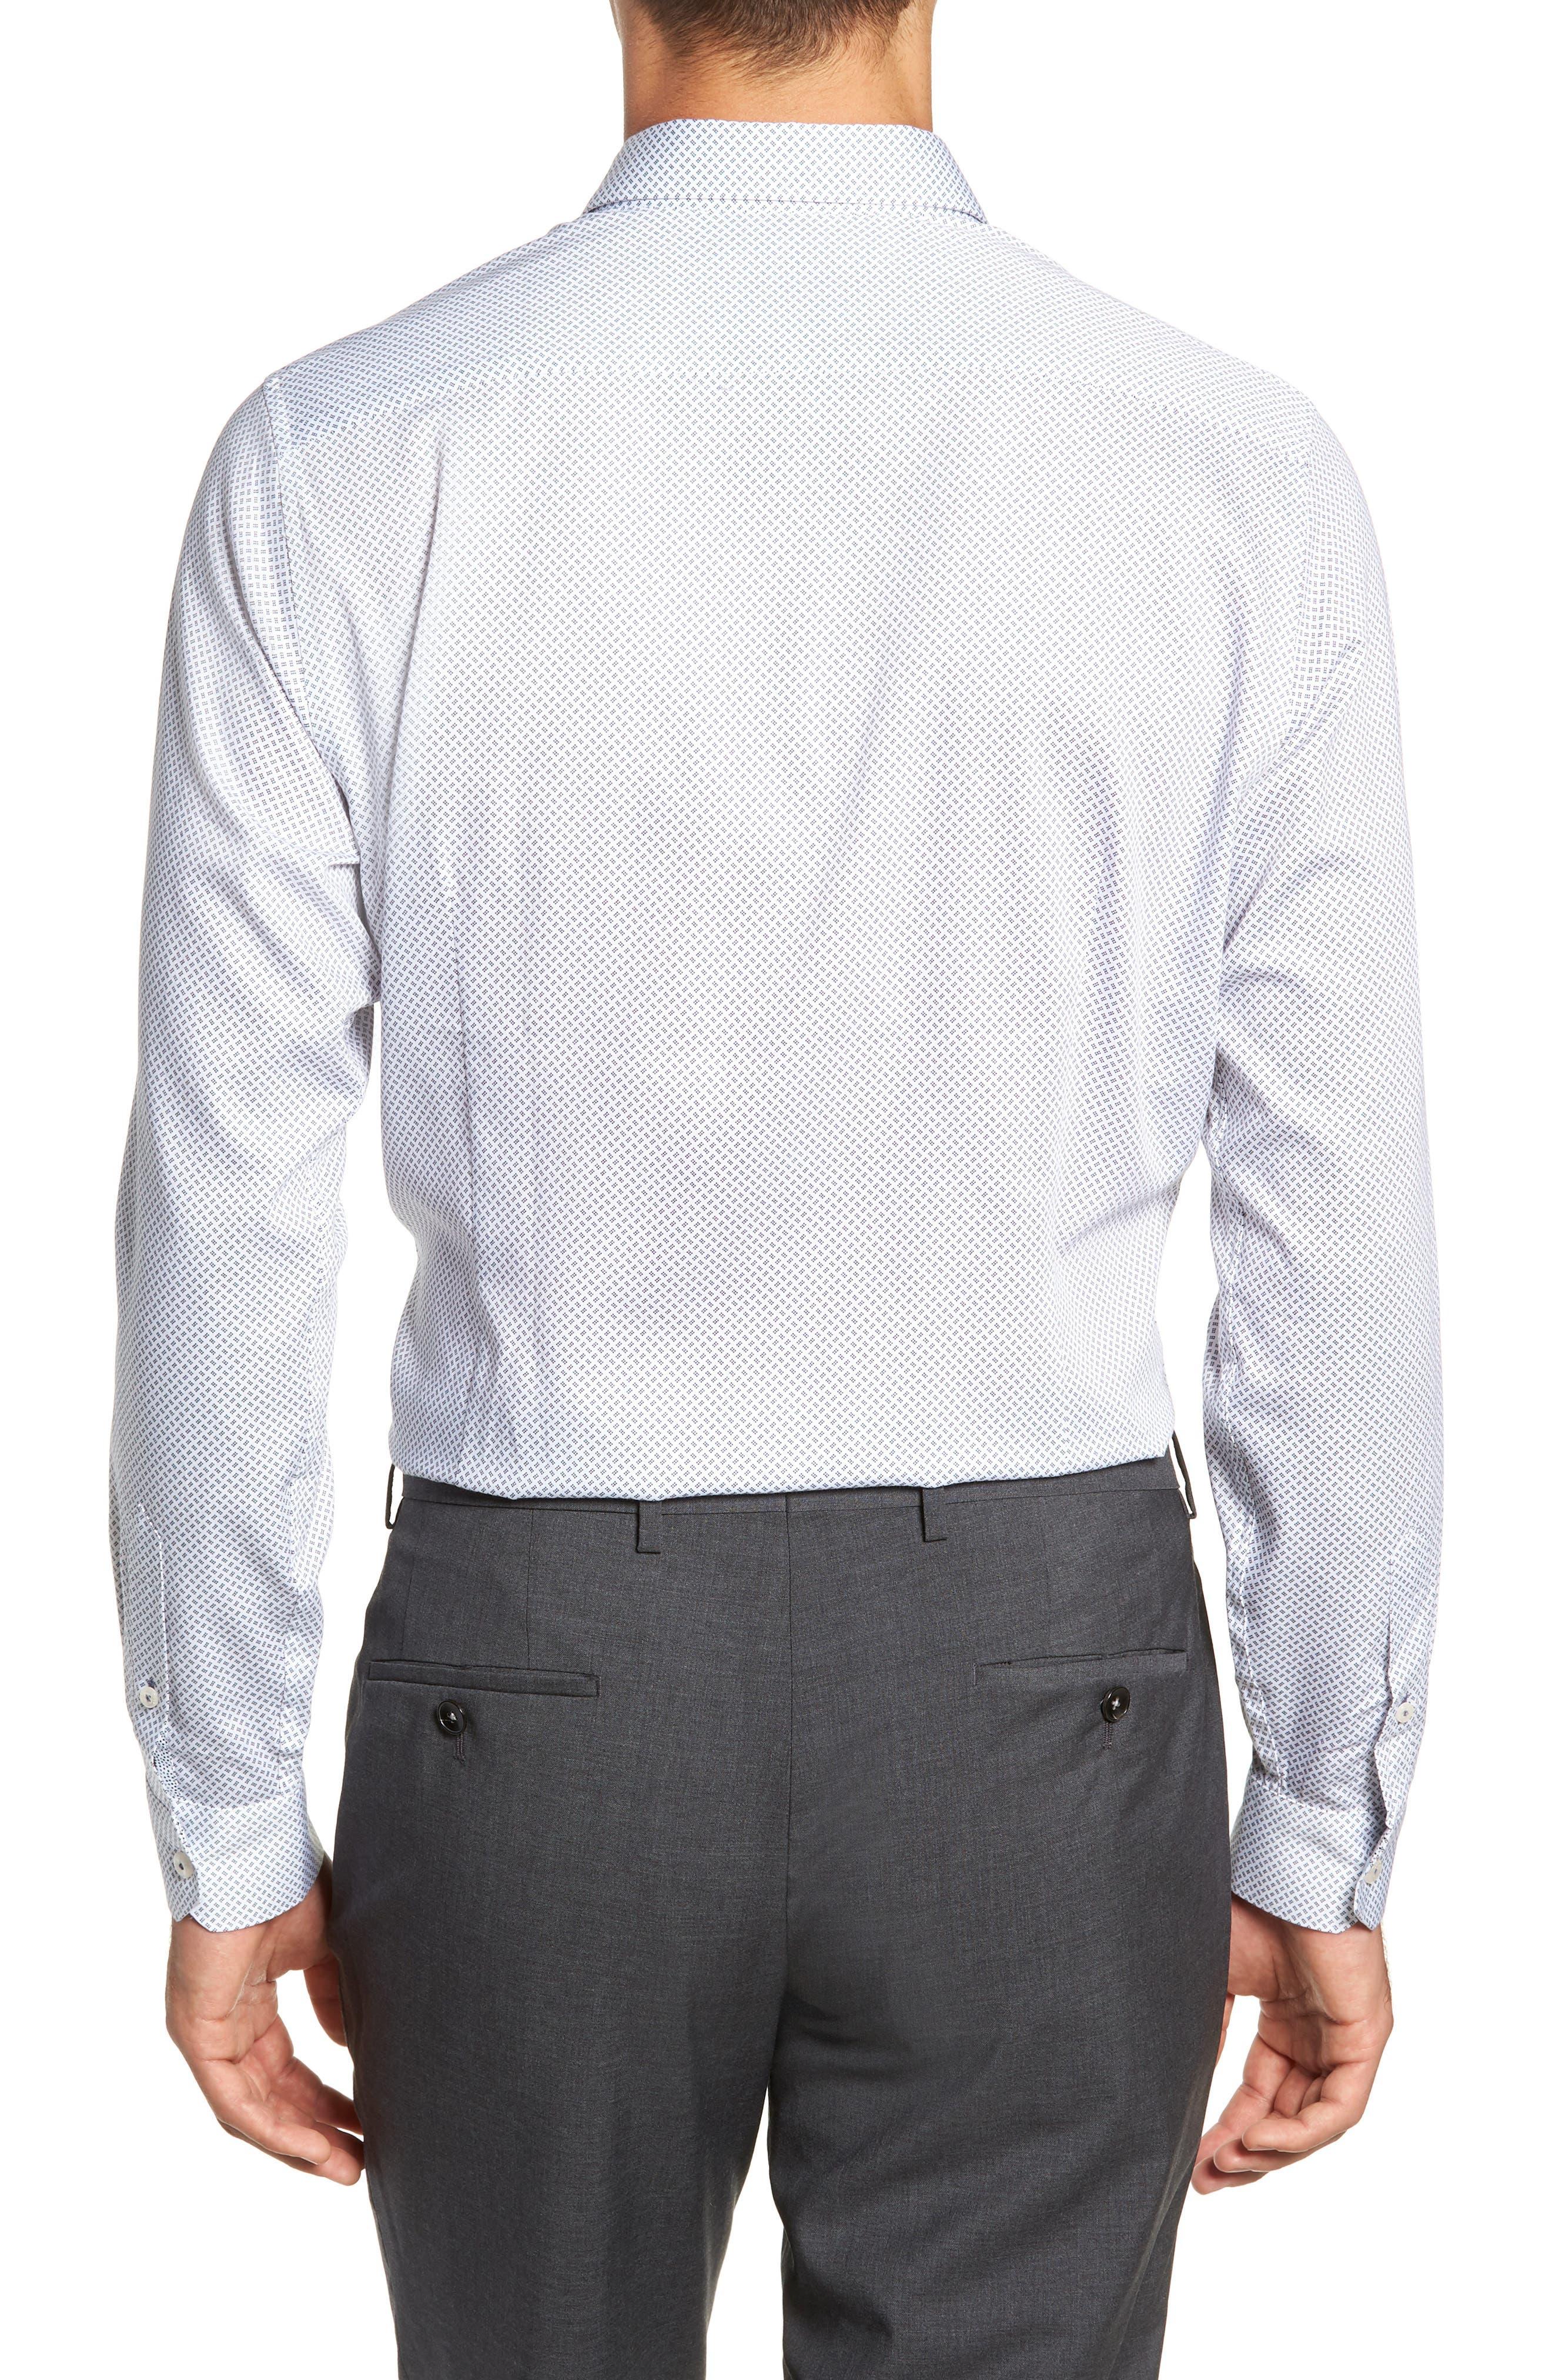 Aspara Modern Fit Geometric Dress Shirt,                             Alternate thumbnail 3, color,                             WHITE/ NAVY